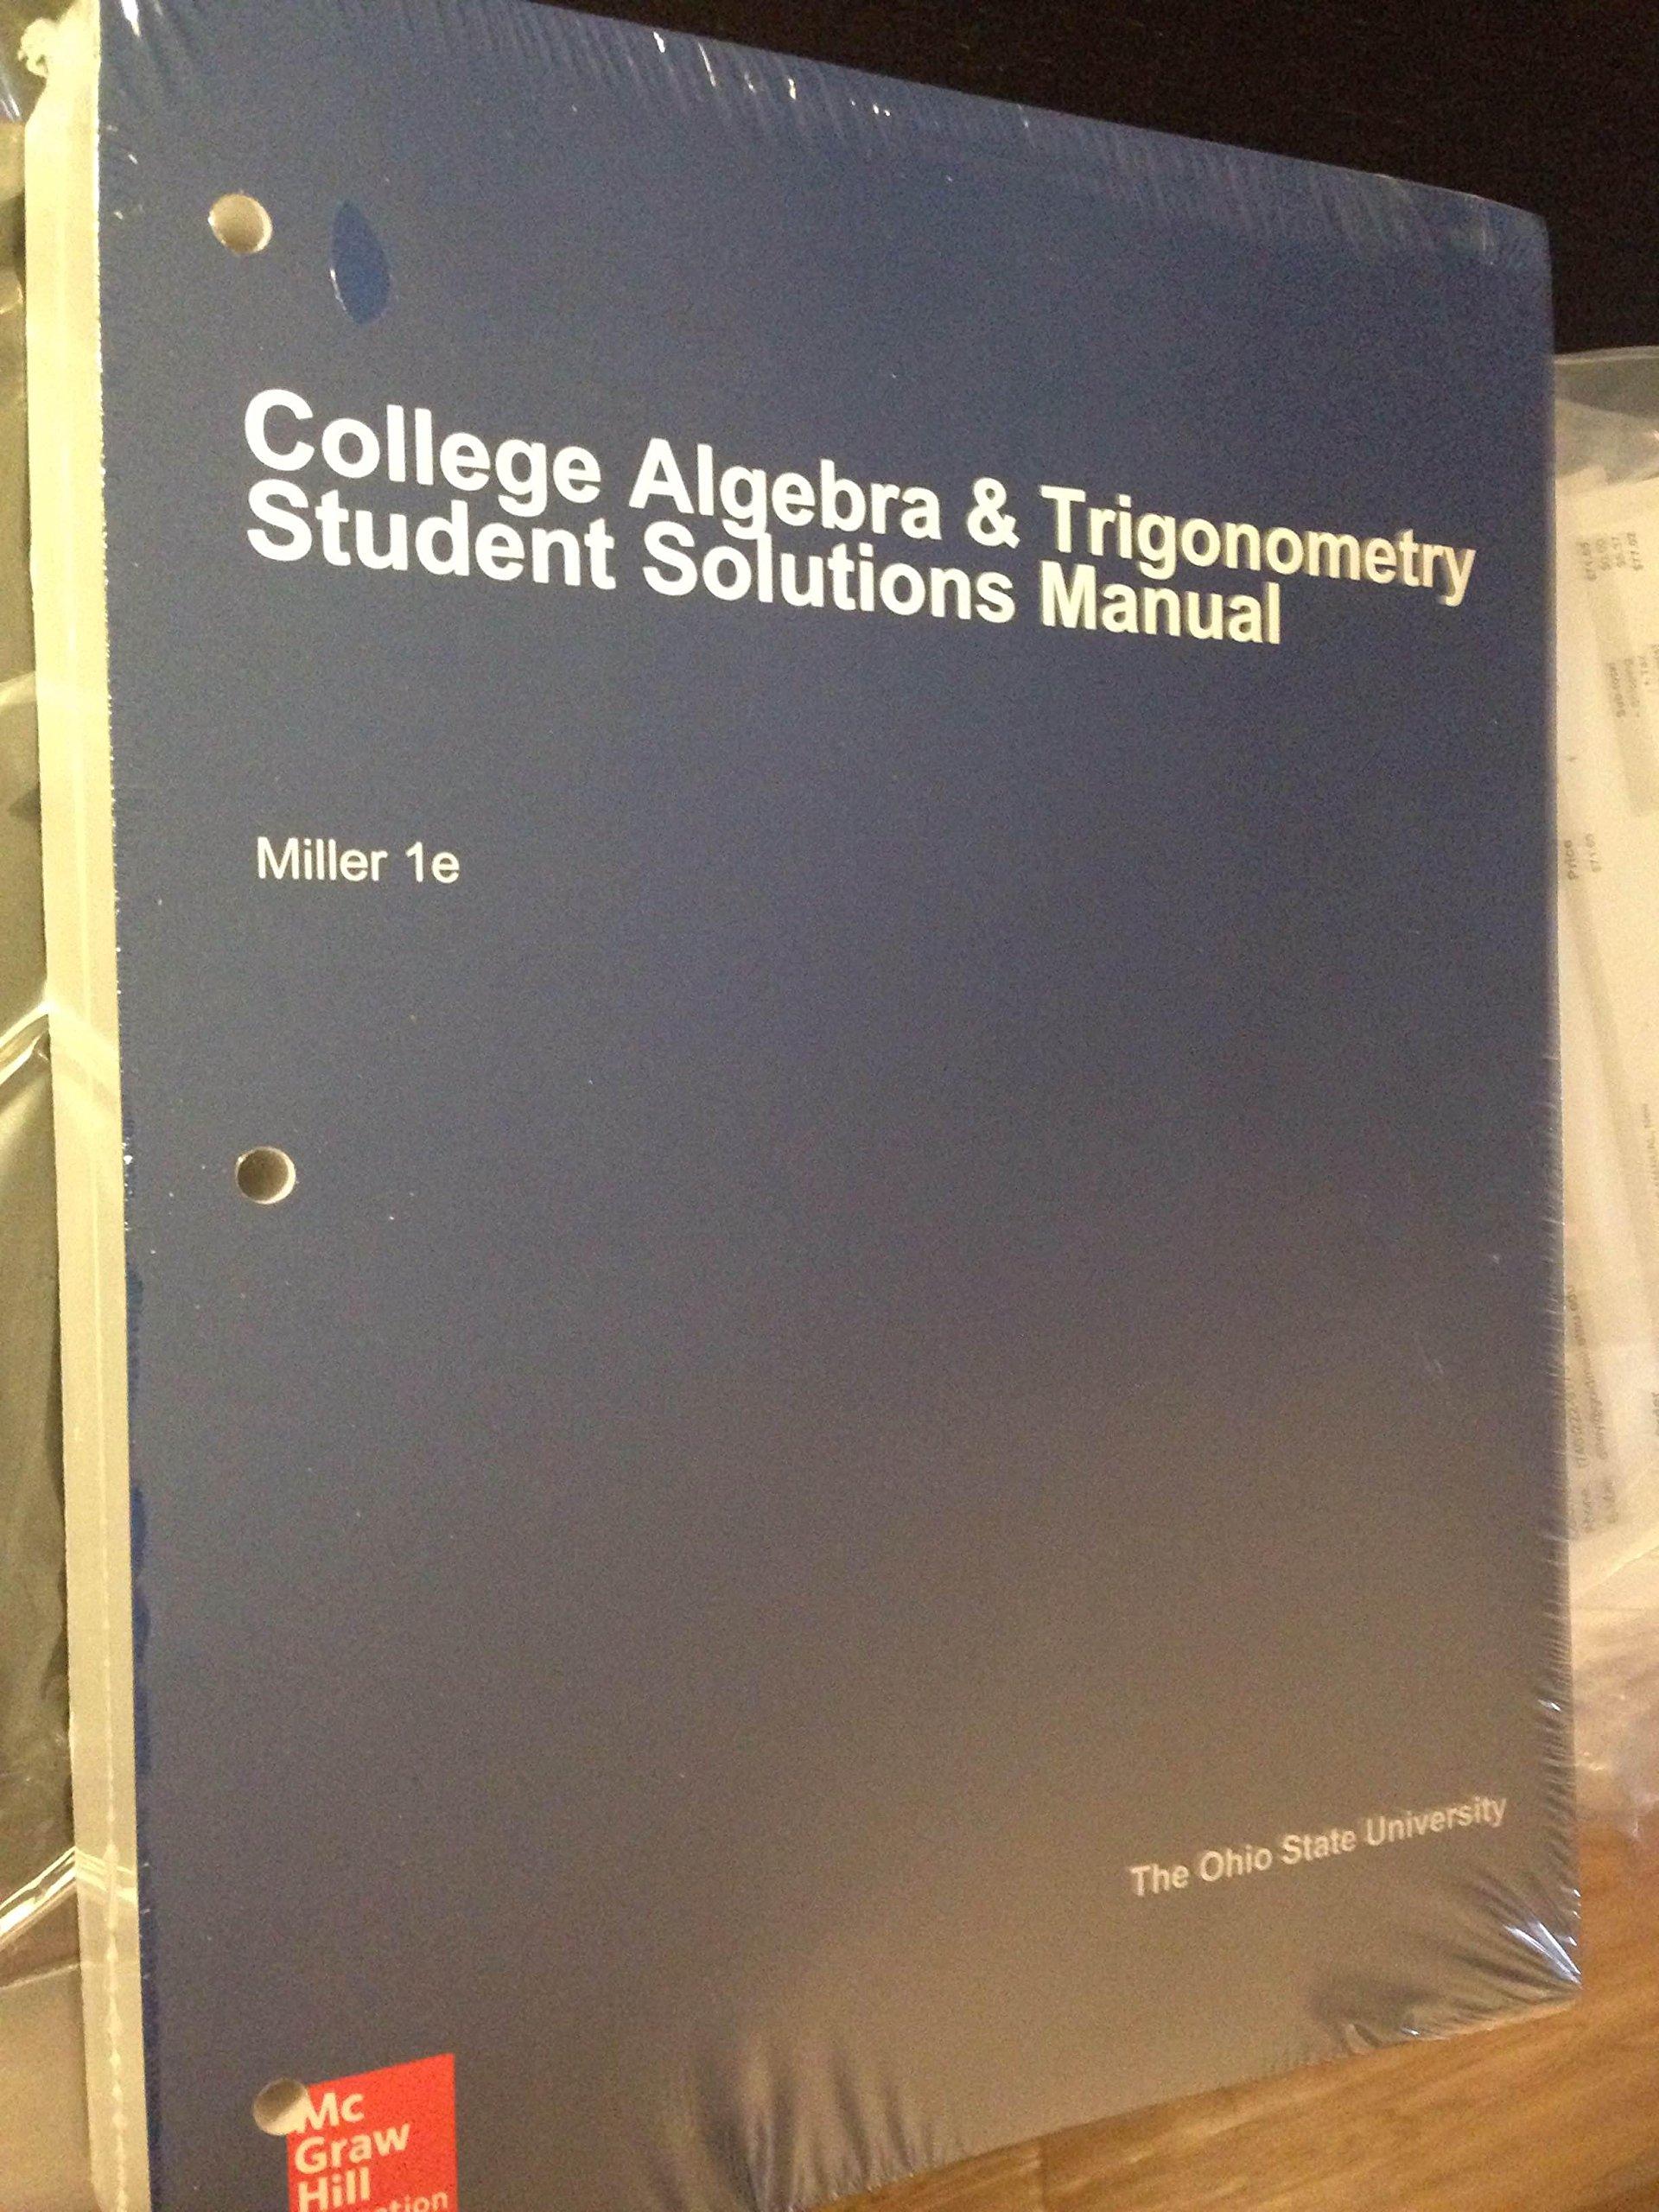 College Algebra & Trigonometry Student Solutions Manual: Miller:  9781308868417: Amazon.com: Books